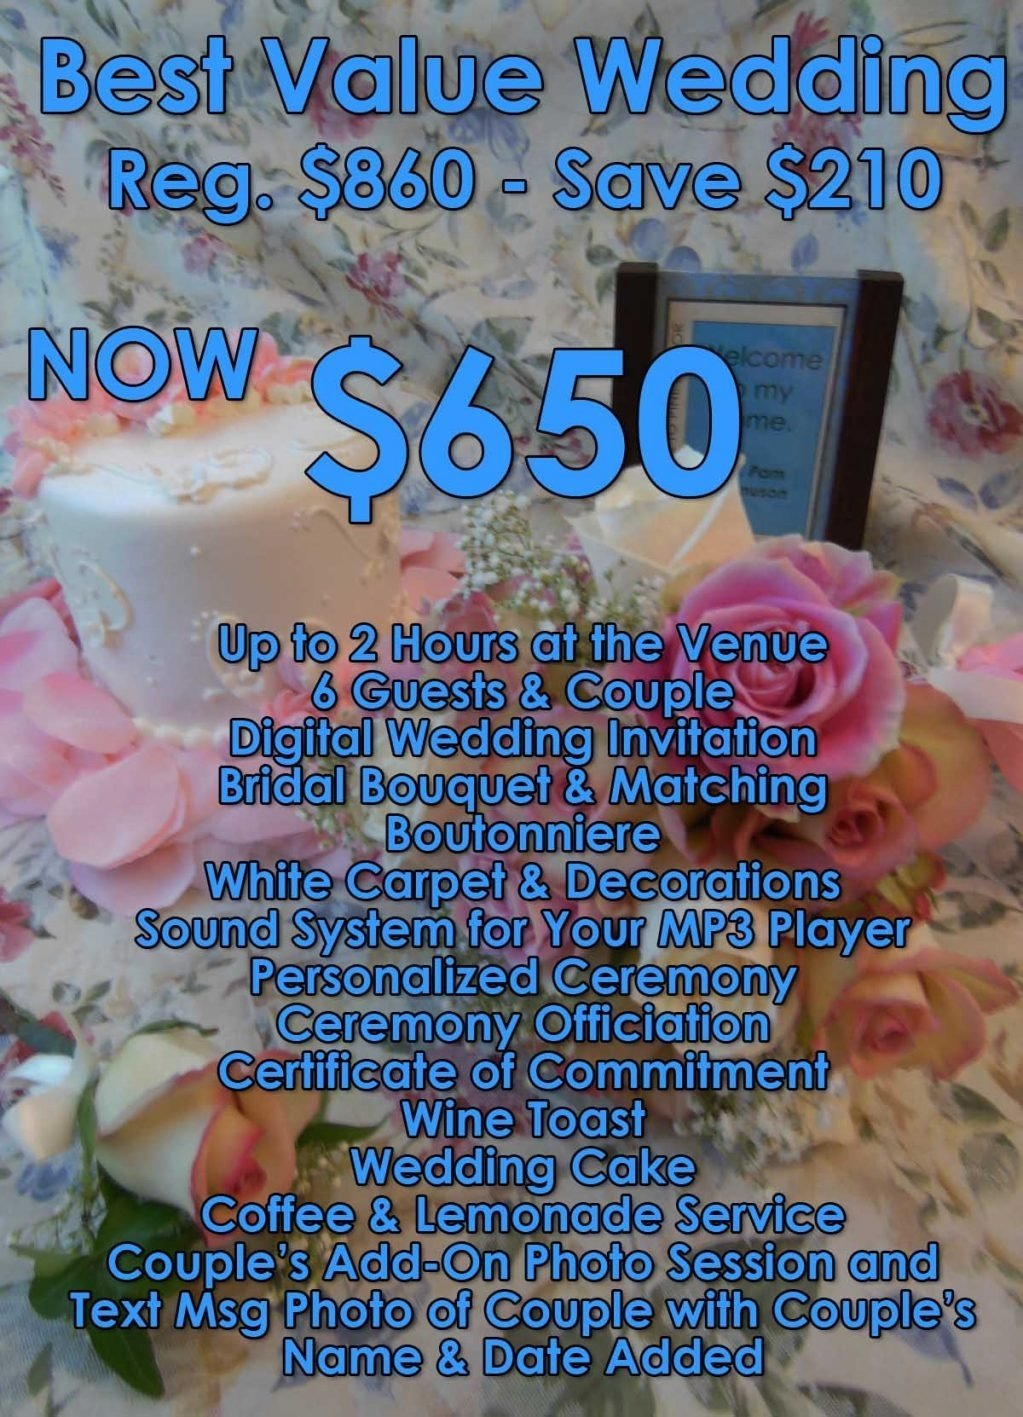 10 Cute Small Wedding Ideas On A Budget wedding wedding small ideas columbus ohio buffet on budget for